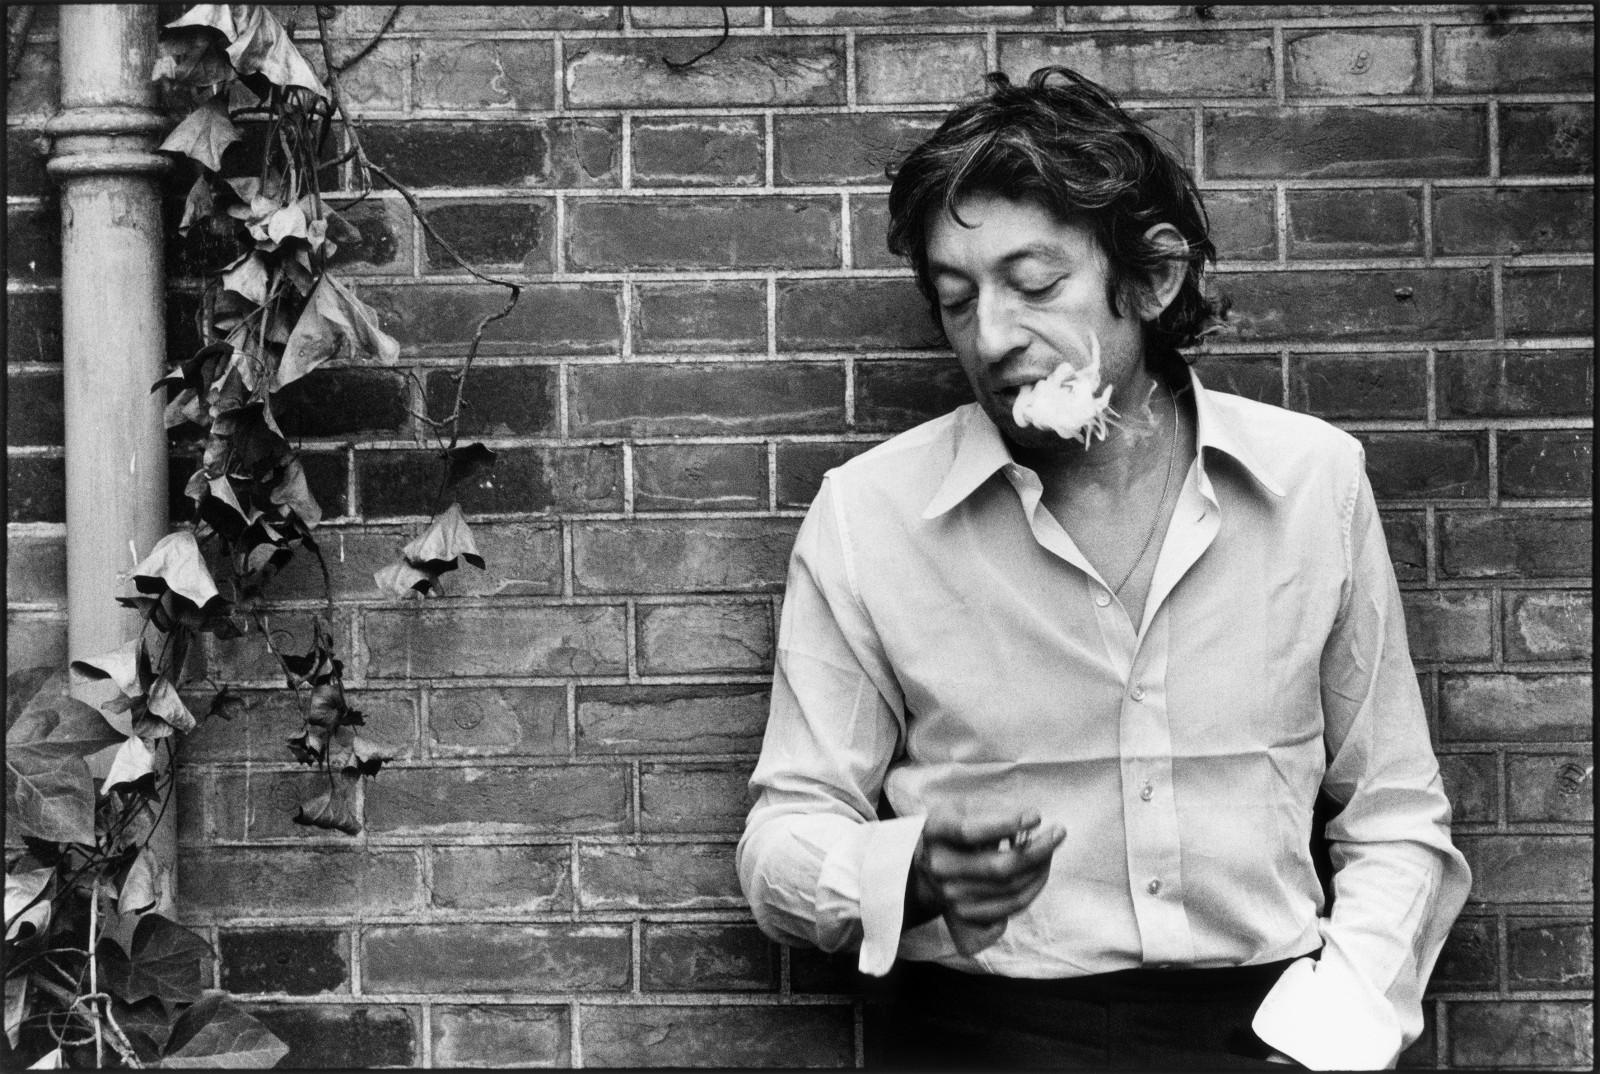 Serge Gainsbourg par Tony Frank